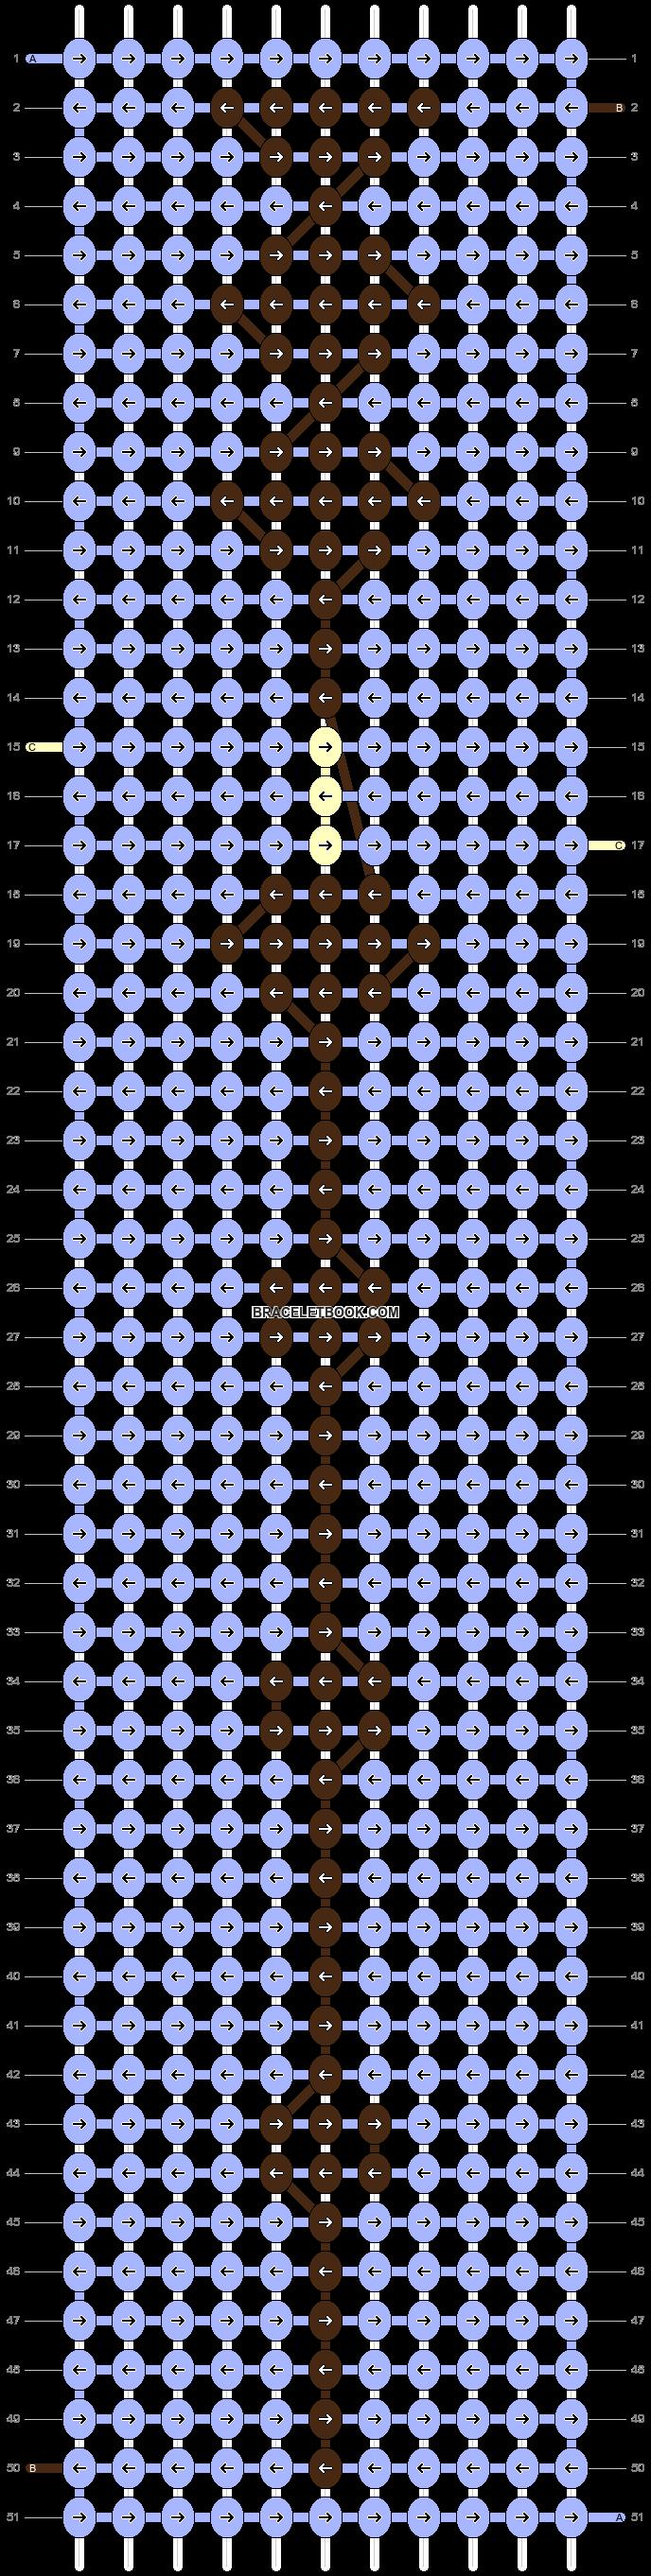 Alpha pattern #51228 pattern